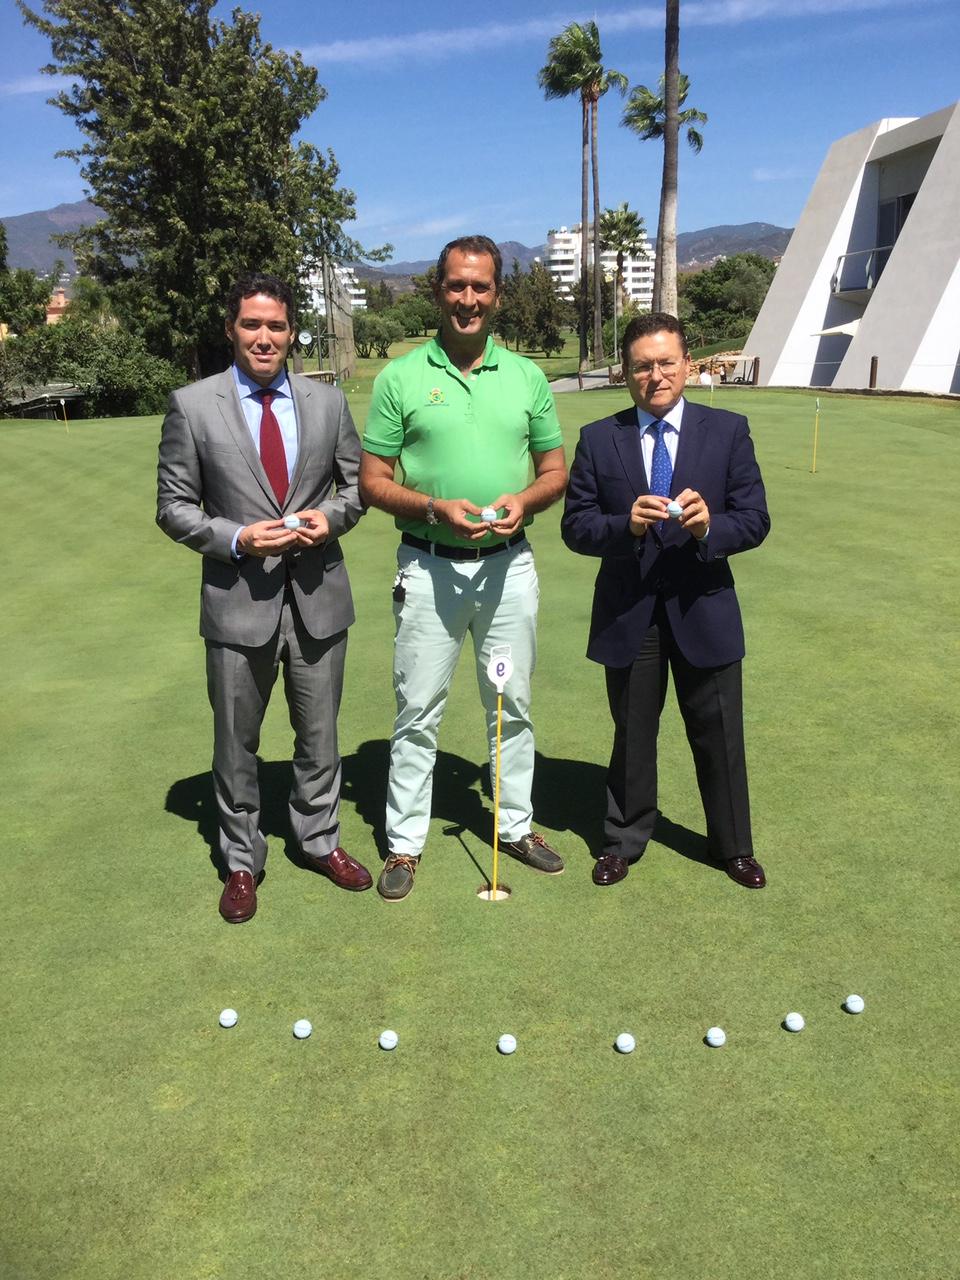 Banco Sabadell Marbella Bqdd Real Club De Golf Guadalmina San Pedro Marbella Golf